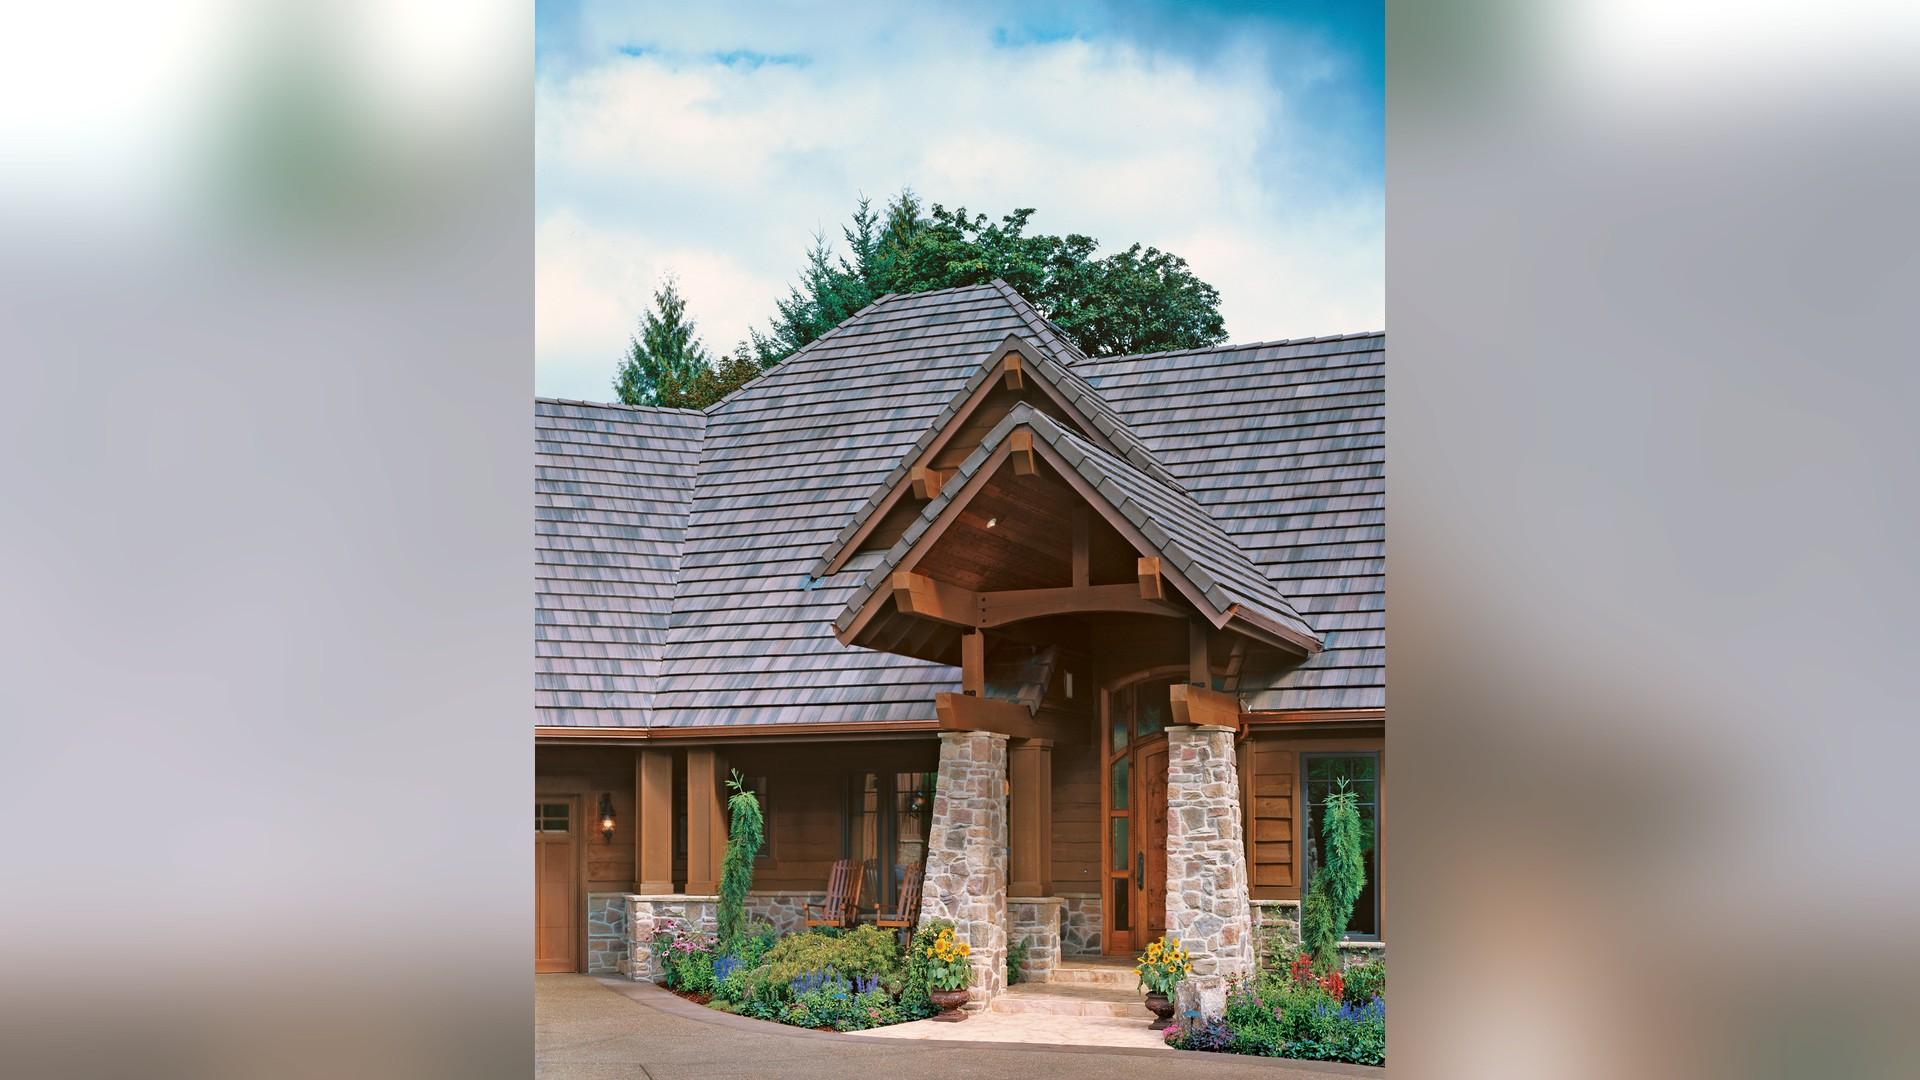 Craftsman House Plan 1411 The Tasseler 4732 Sqft 4 Beds